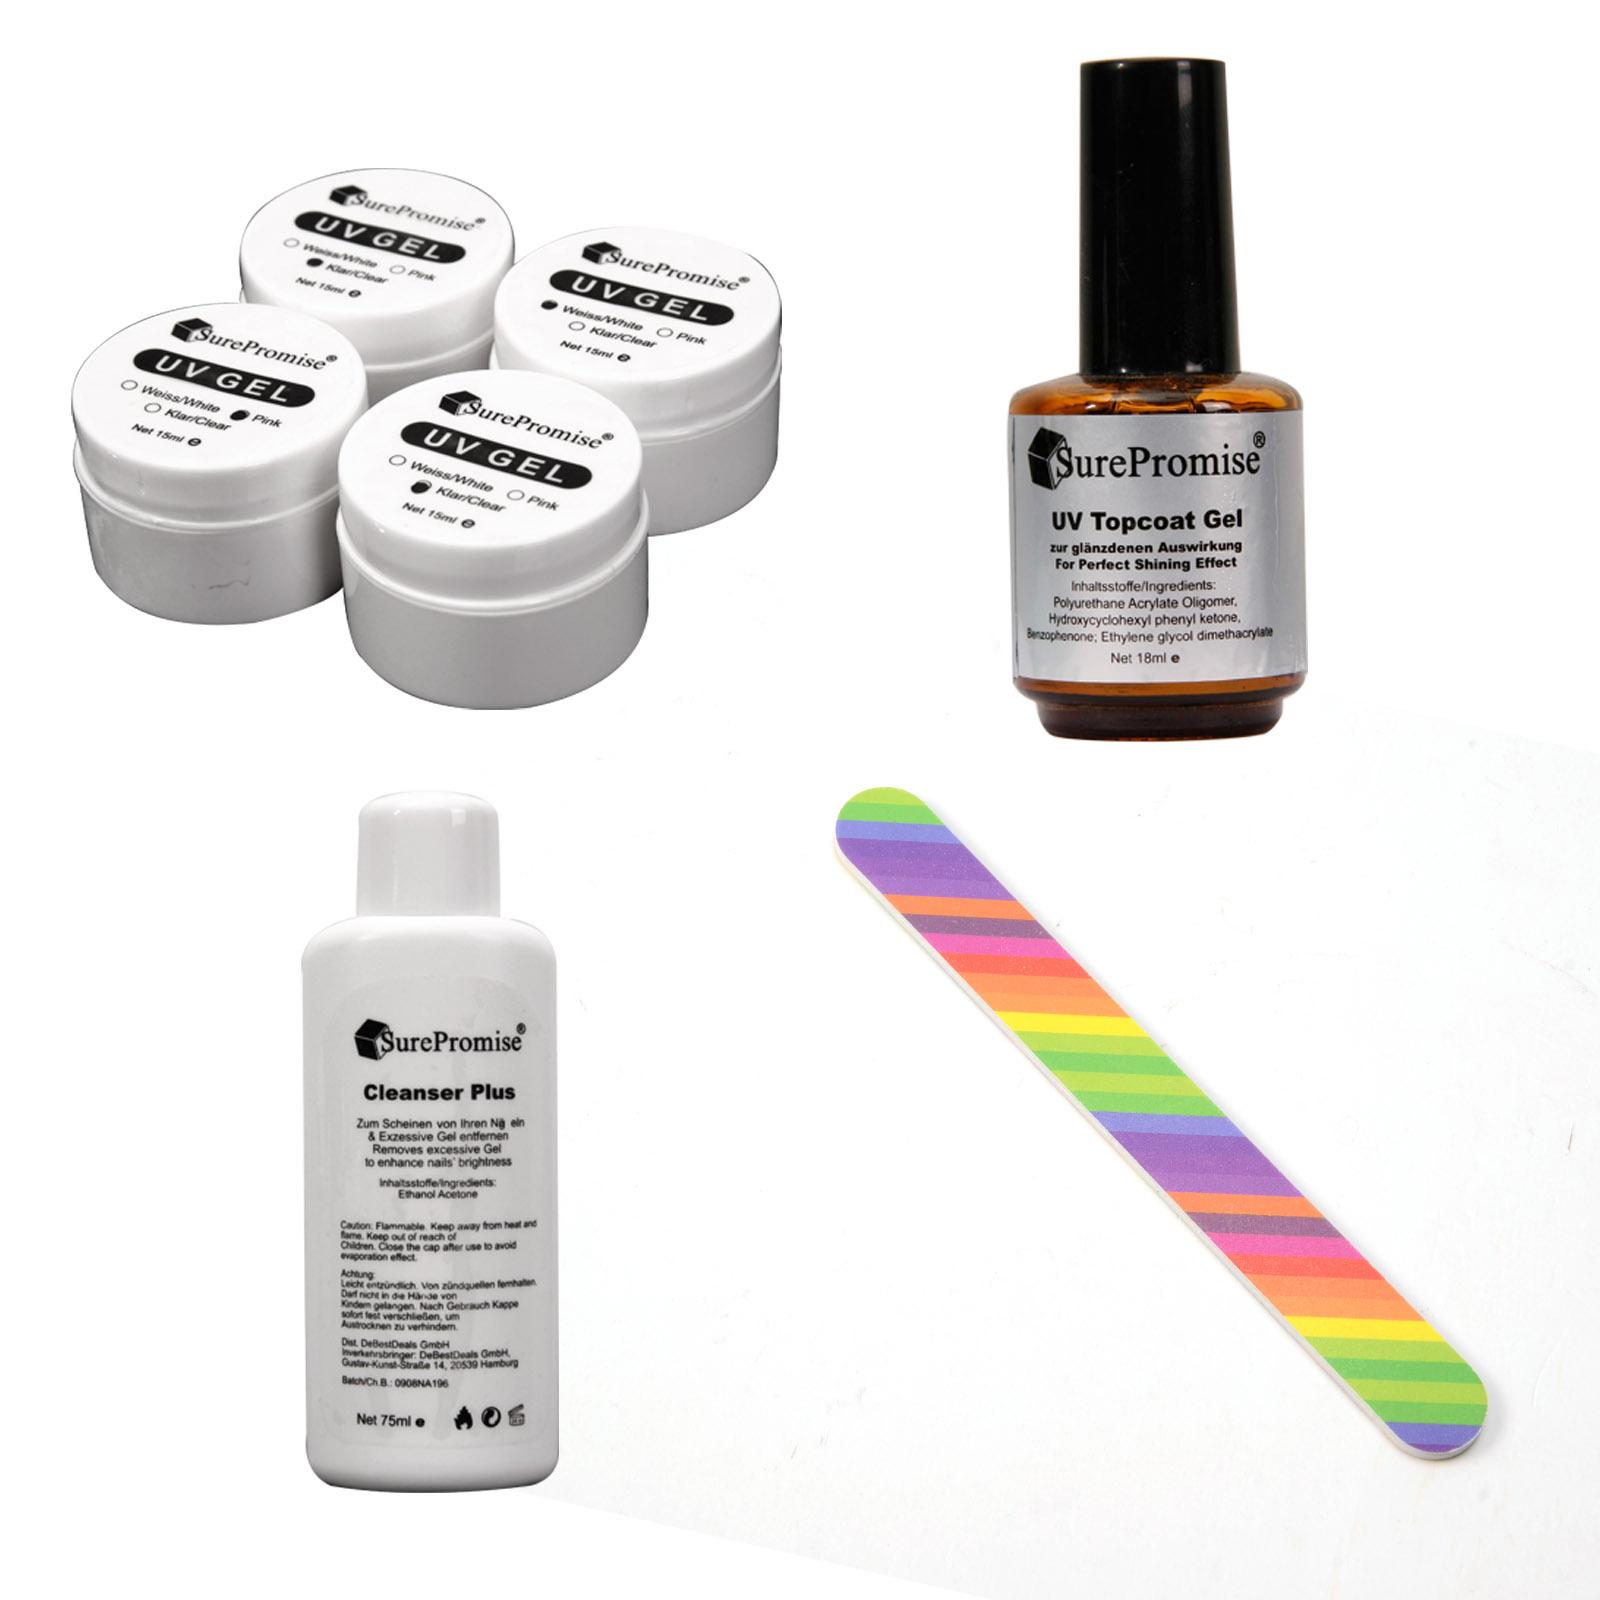 nail art uv gel starter kit topcoat cleanser glue brushes. Black Bedroom Furniture Sets. Home Design Ideas